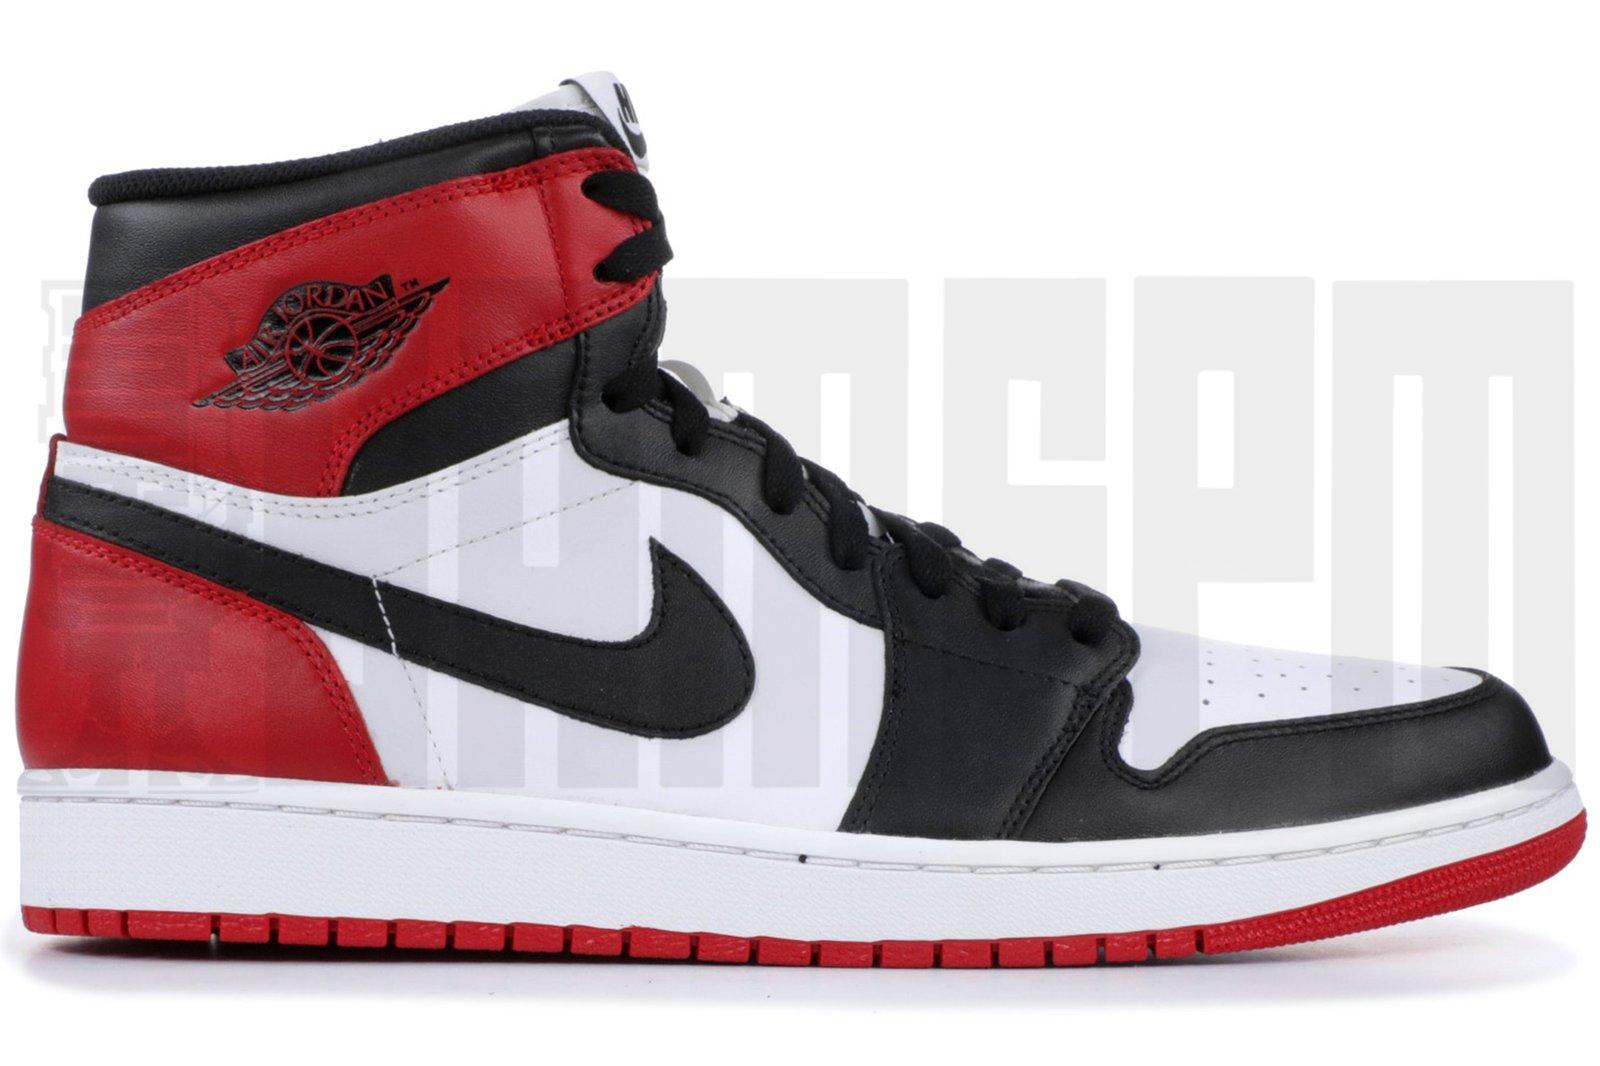 san francisco 7fe2c 10a40 Nike AIR JORDAN 1 RETRO HIGH OG